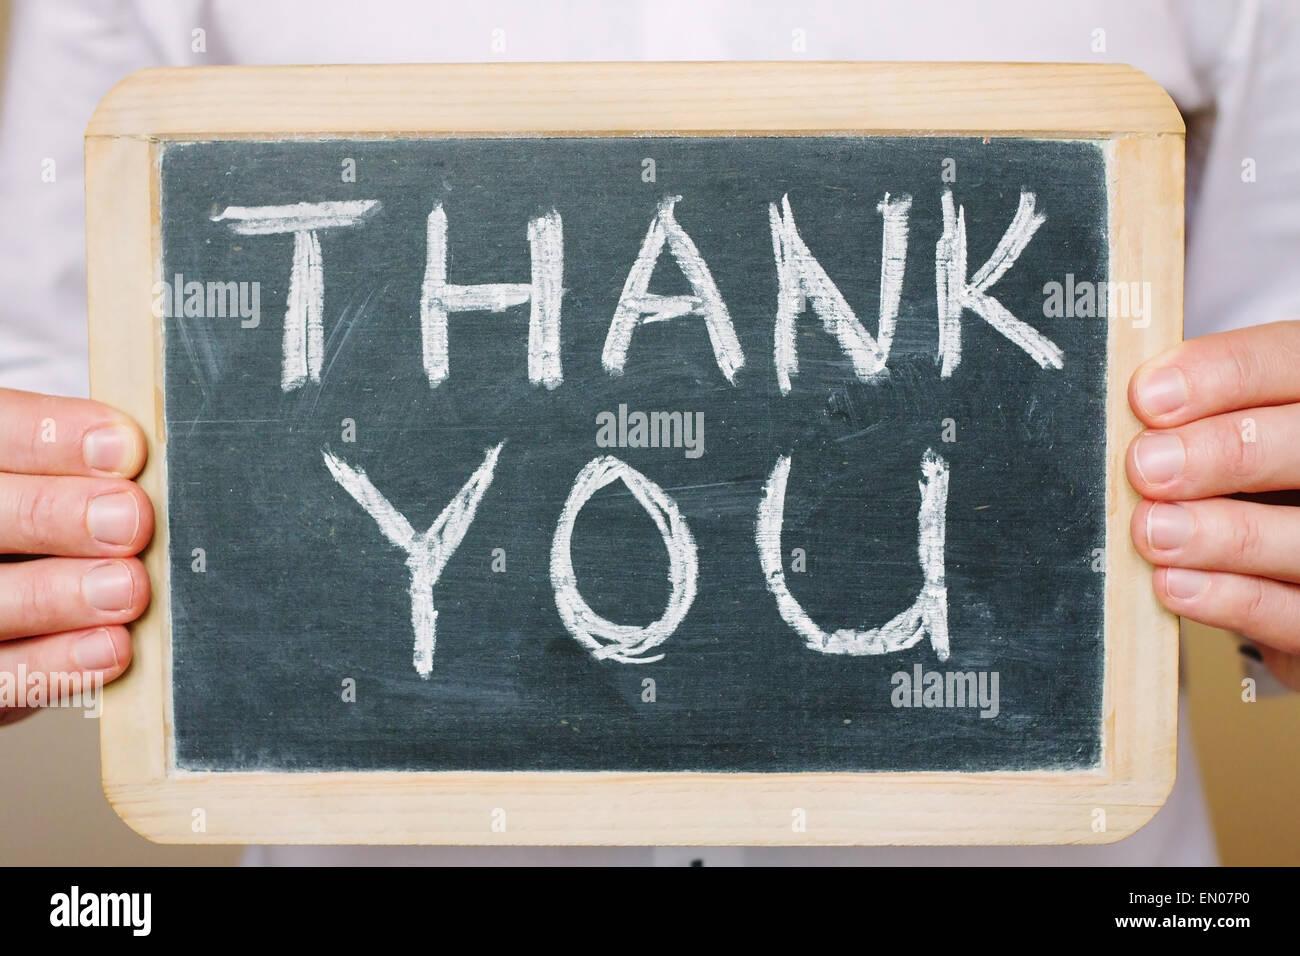 thank you - concept of gratitude - Stock Image